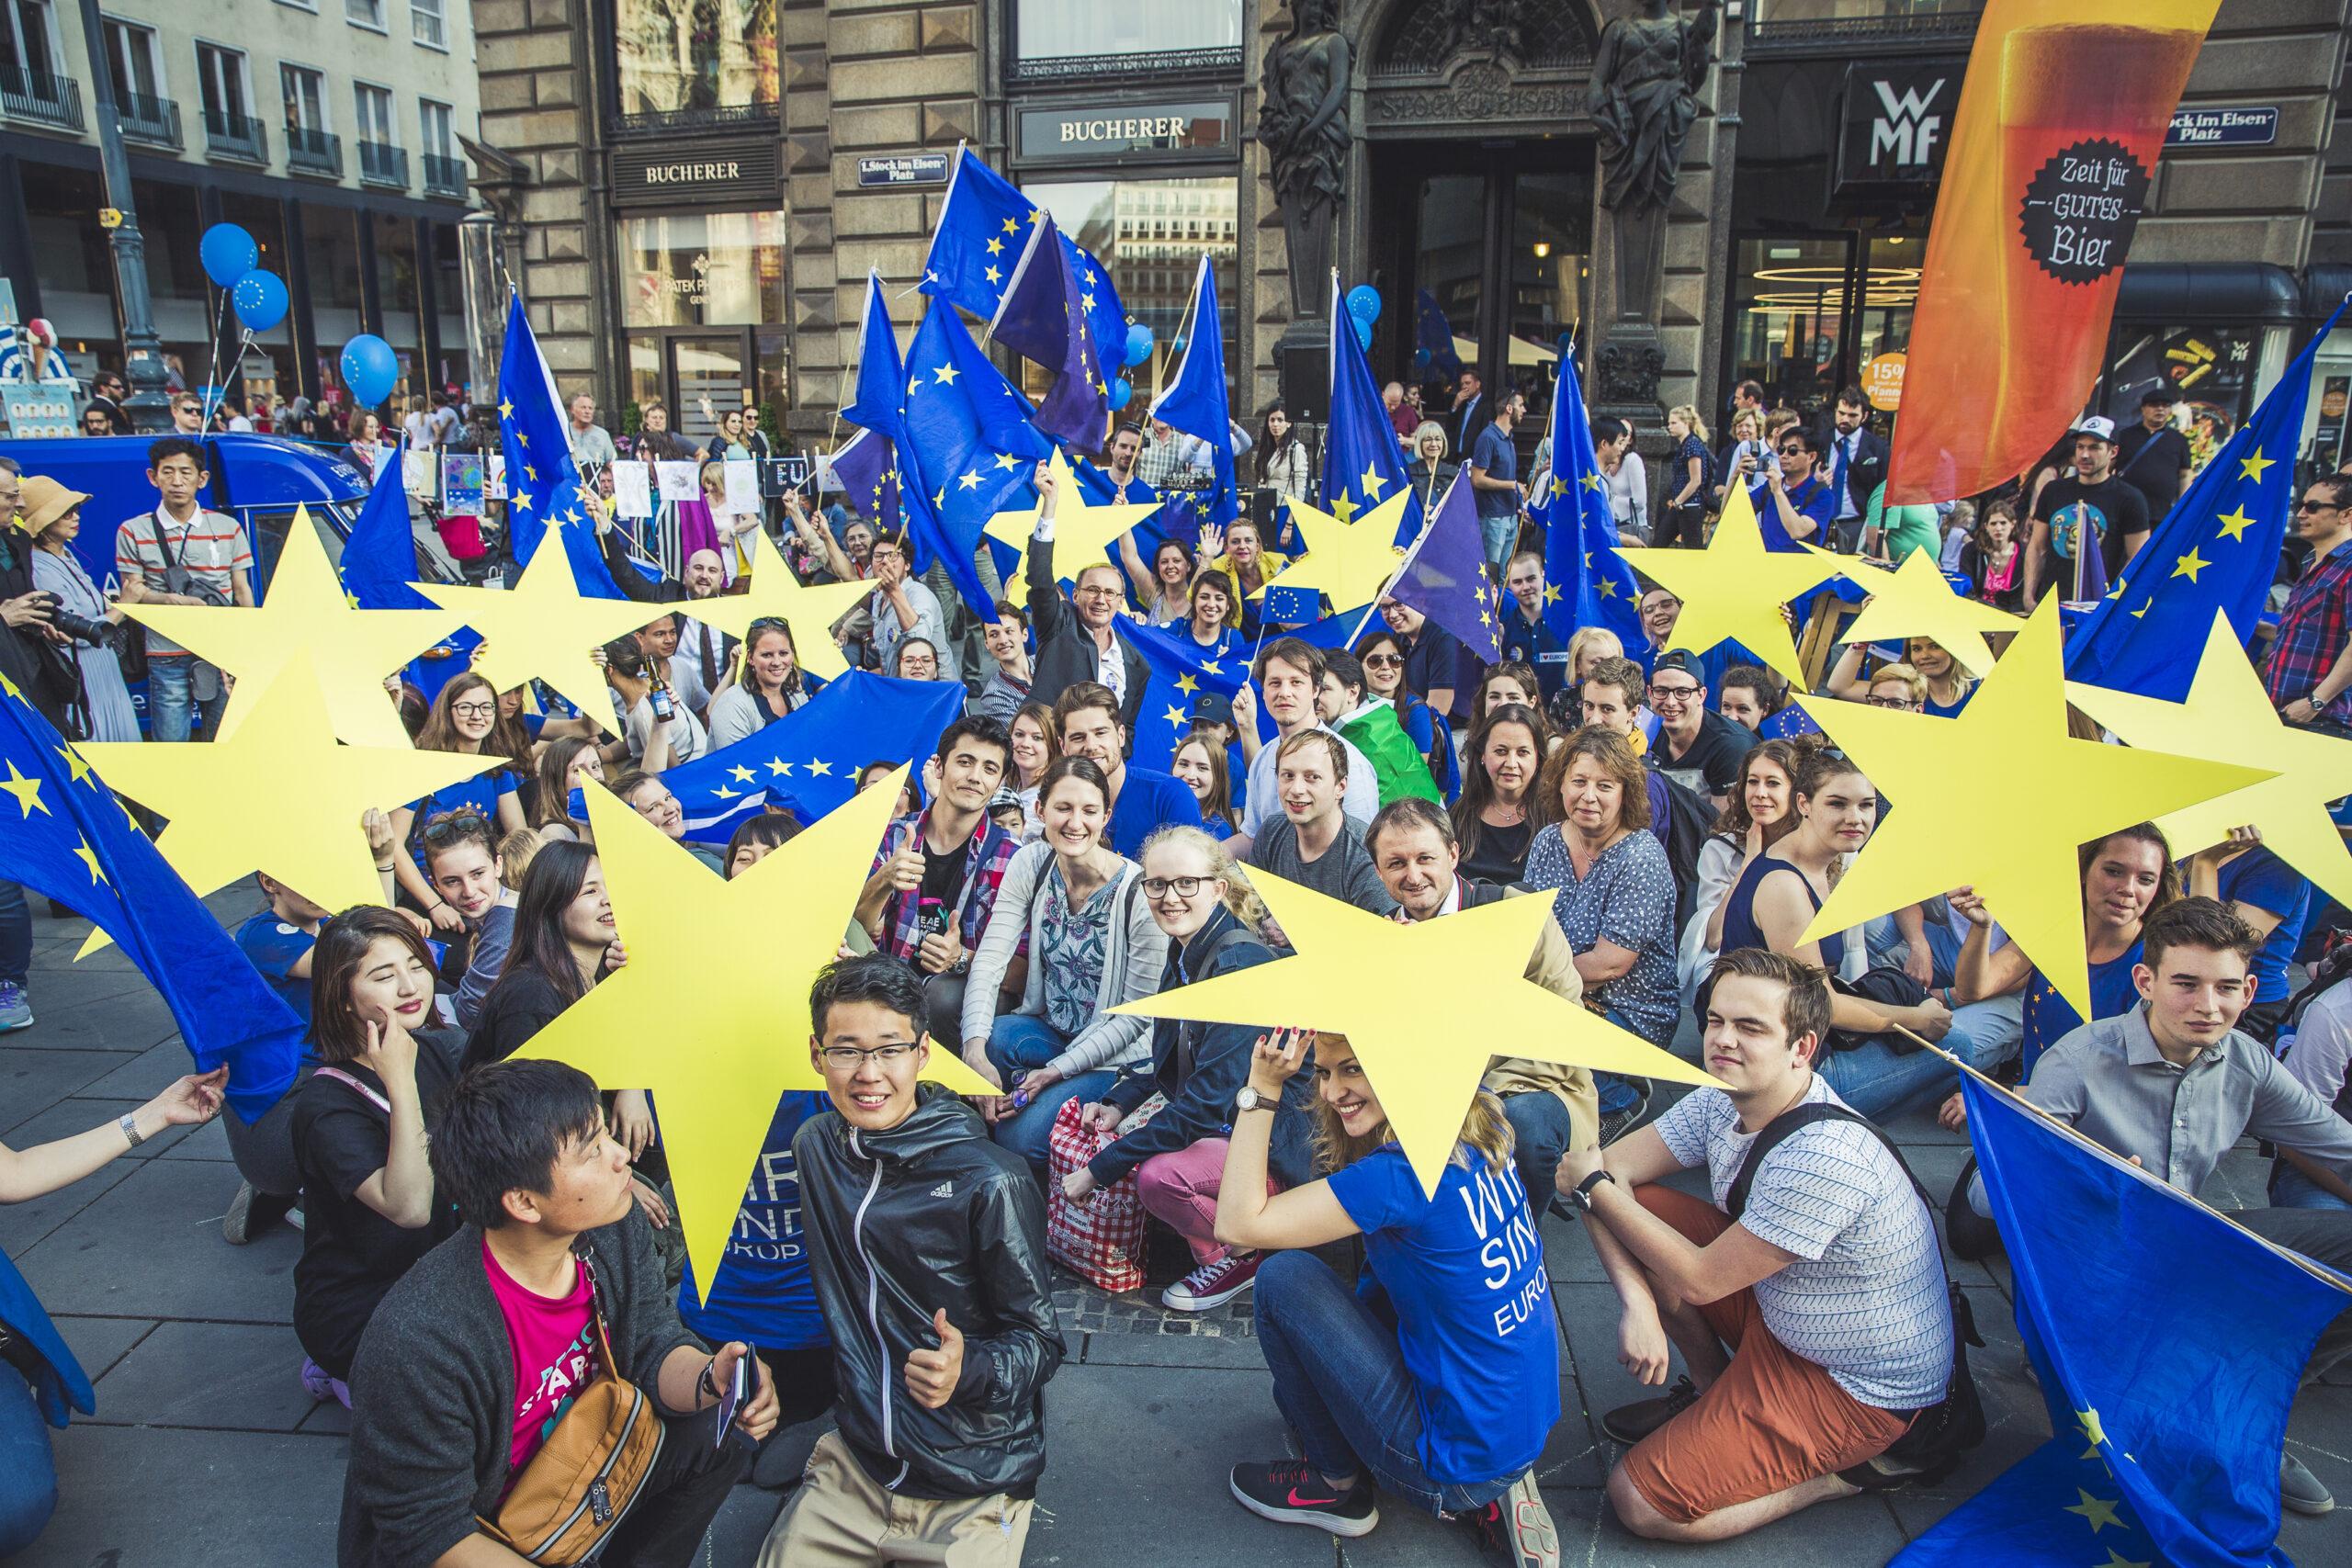 BGF_EU Sterne Gruppenfoto